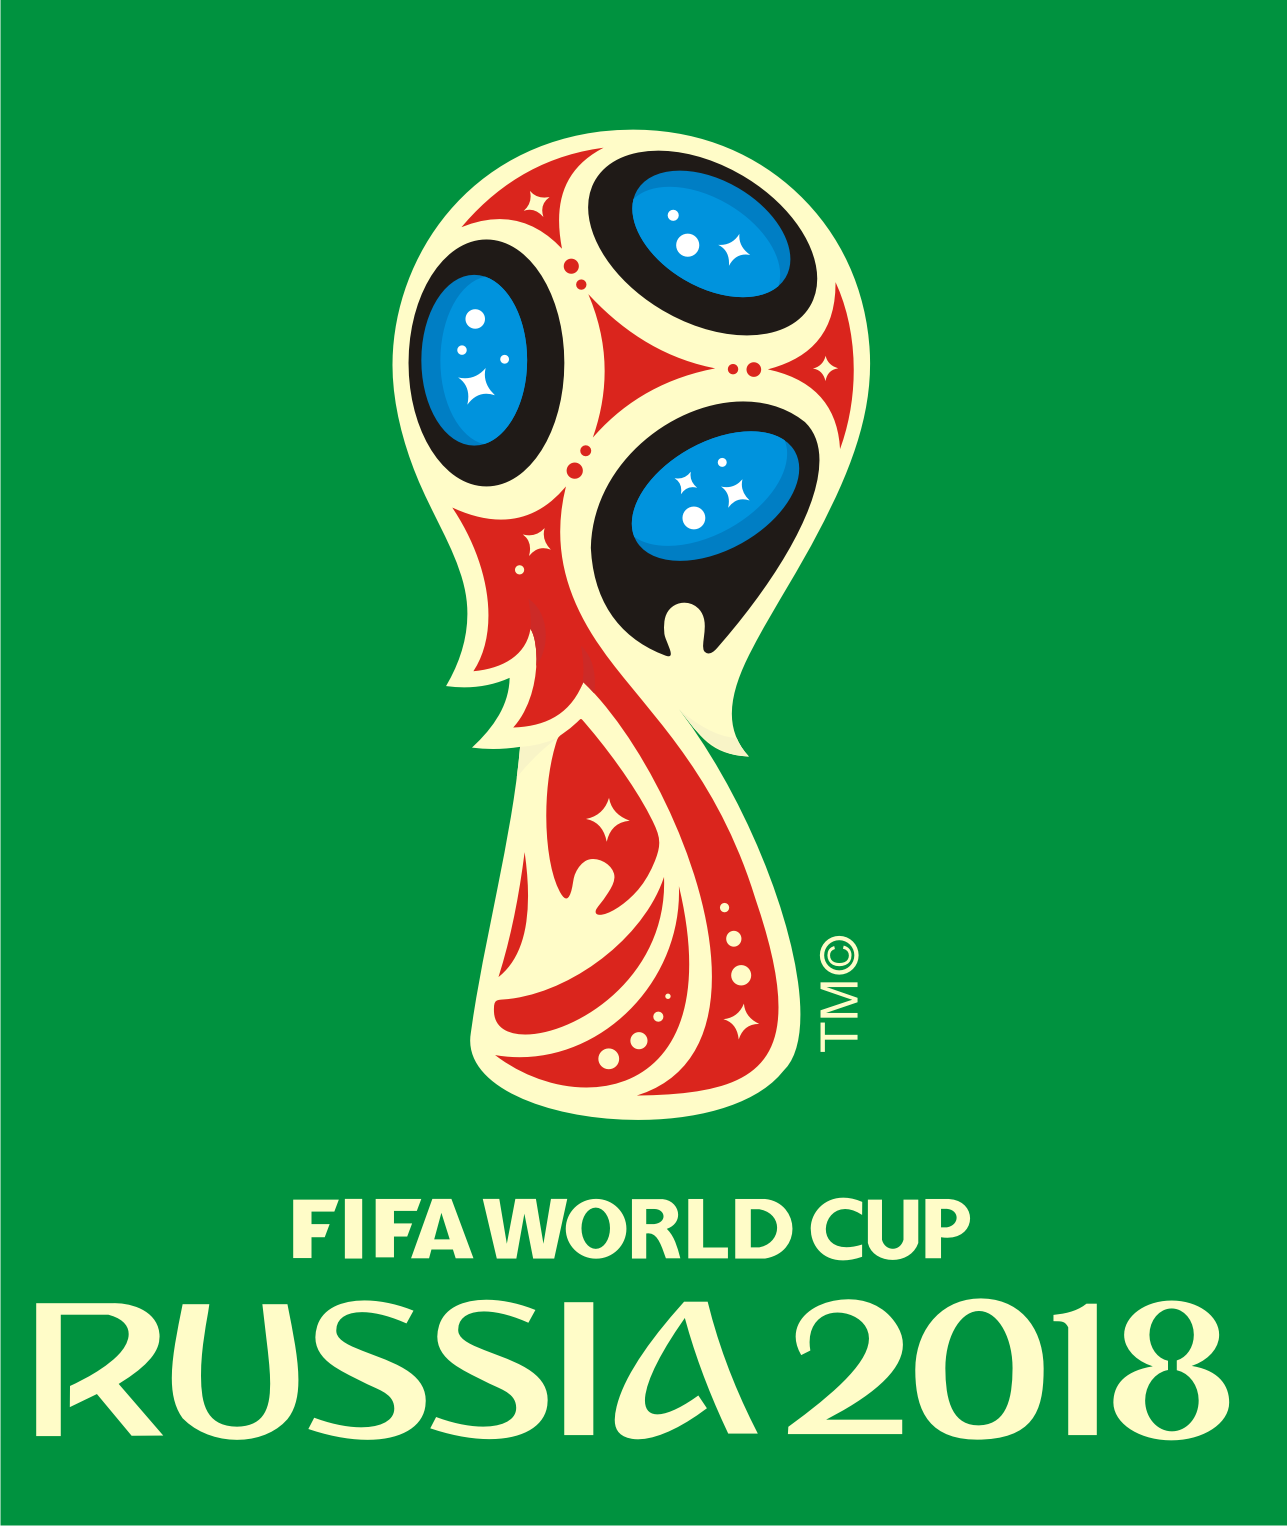 Logo Resmi Piala Dunia FIFA 2018 Rusia.